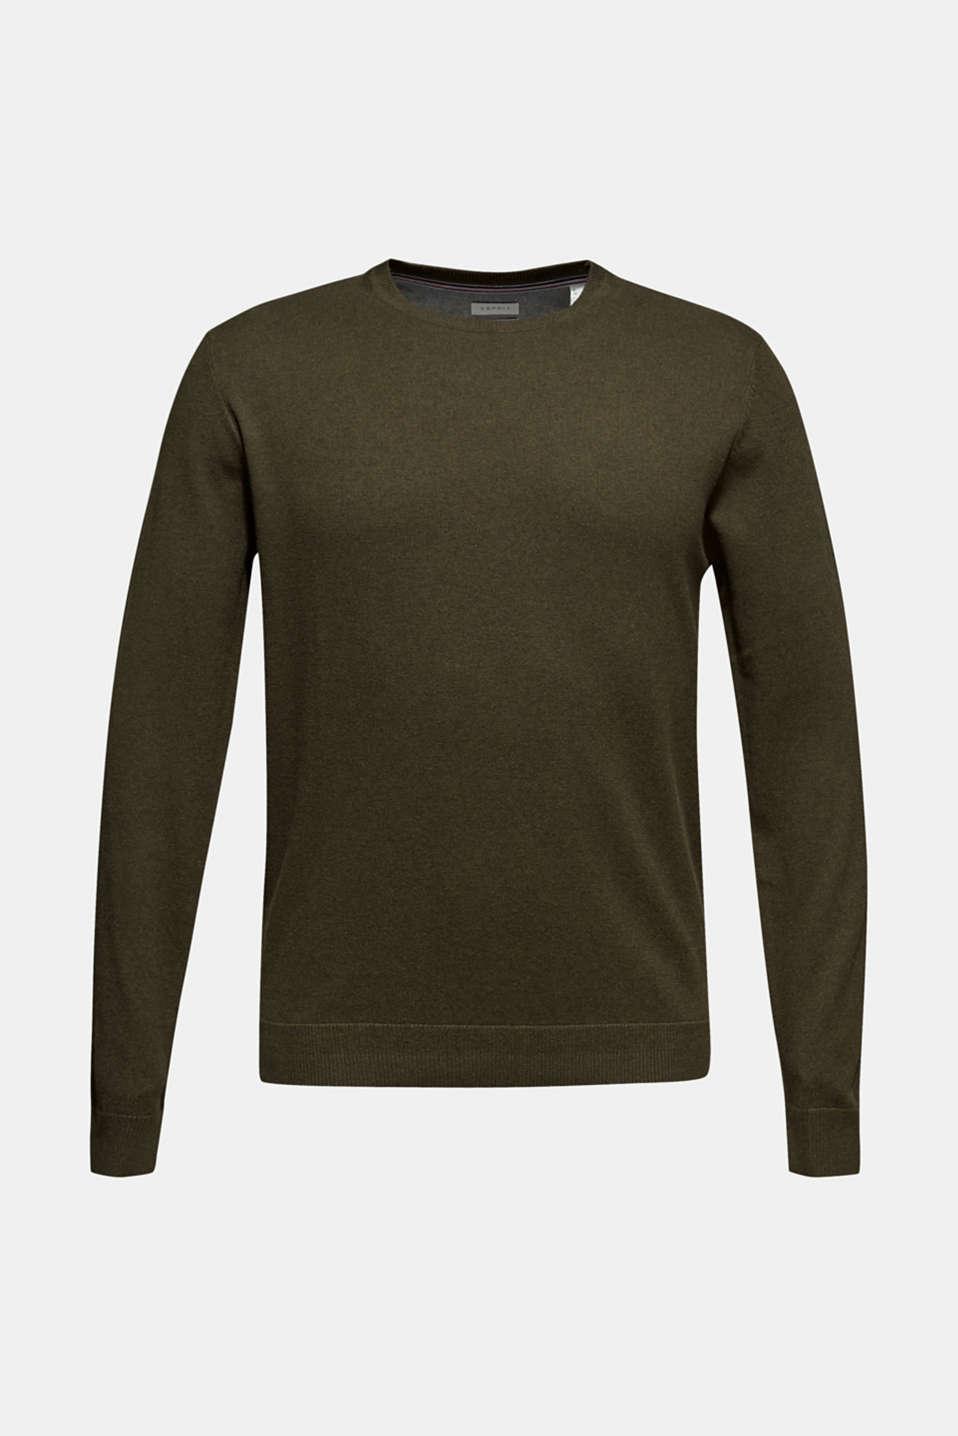 With cashmere: Basic style jumper, DARK KHAKI, detail image number 5